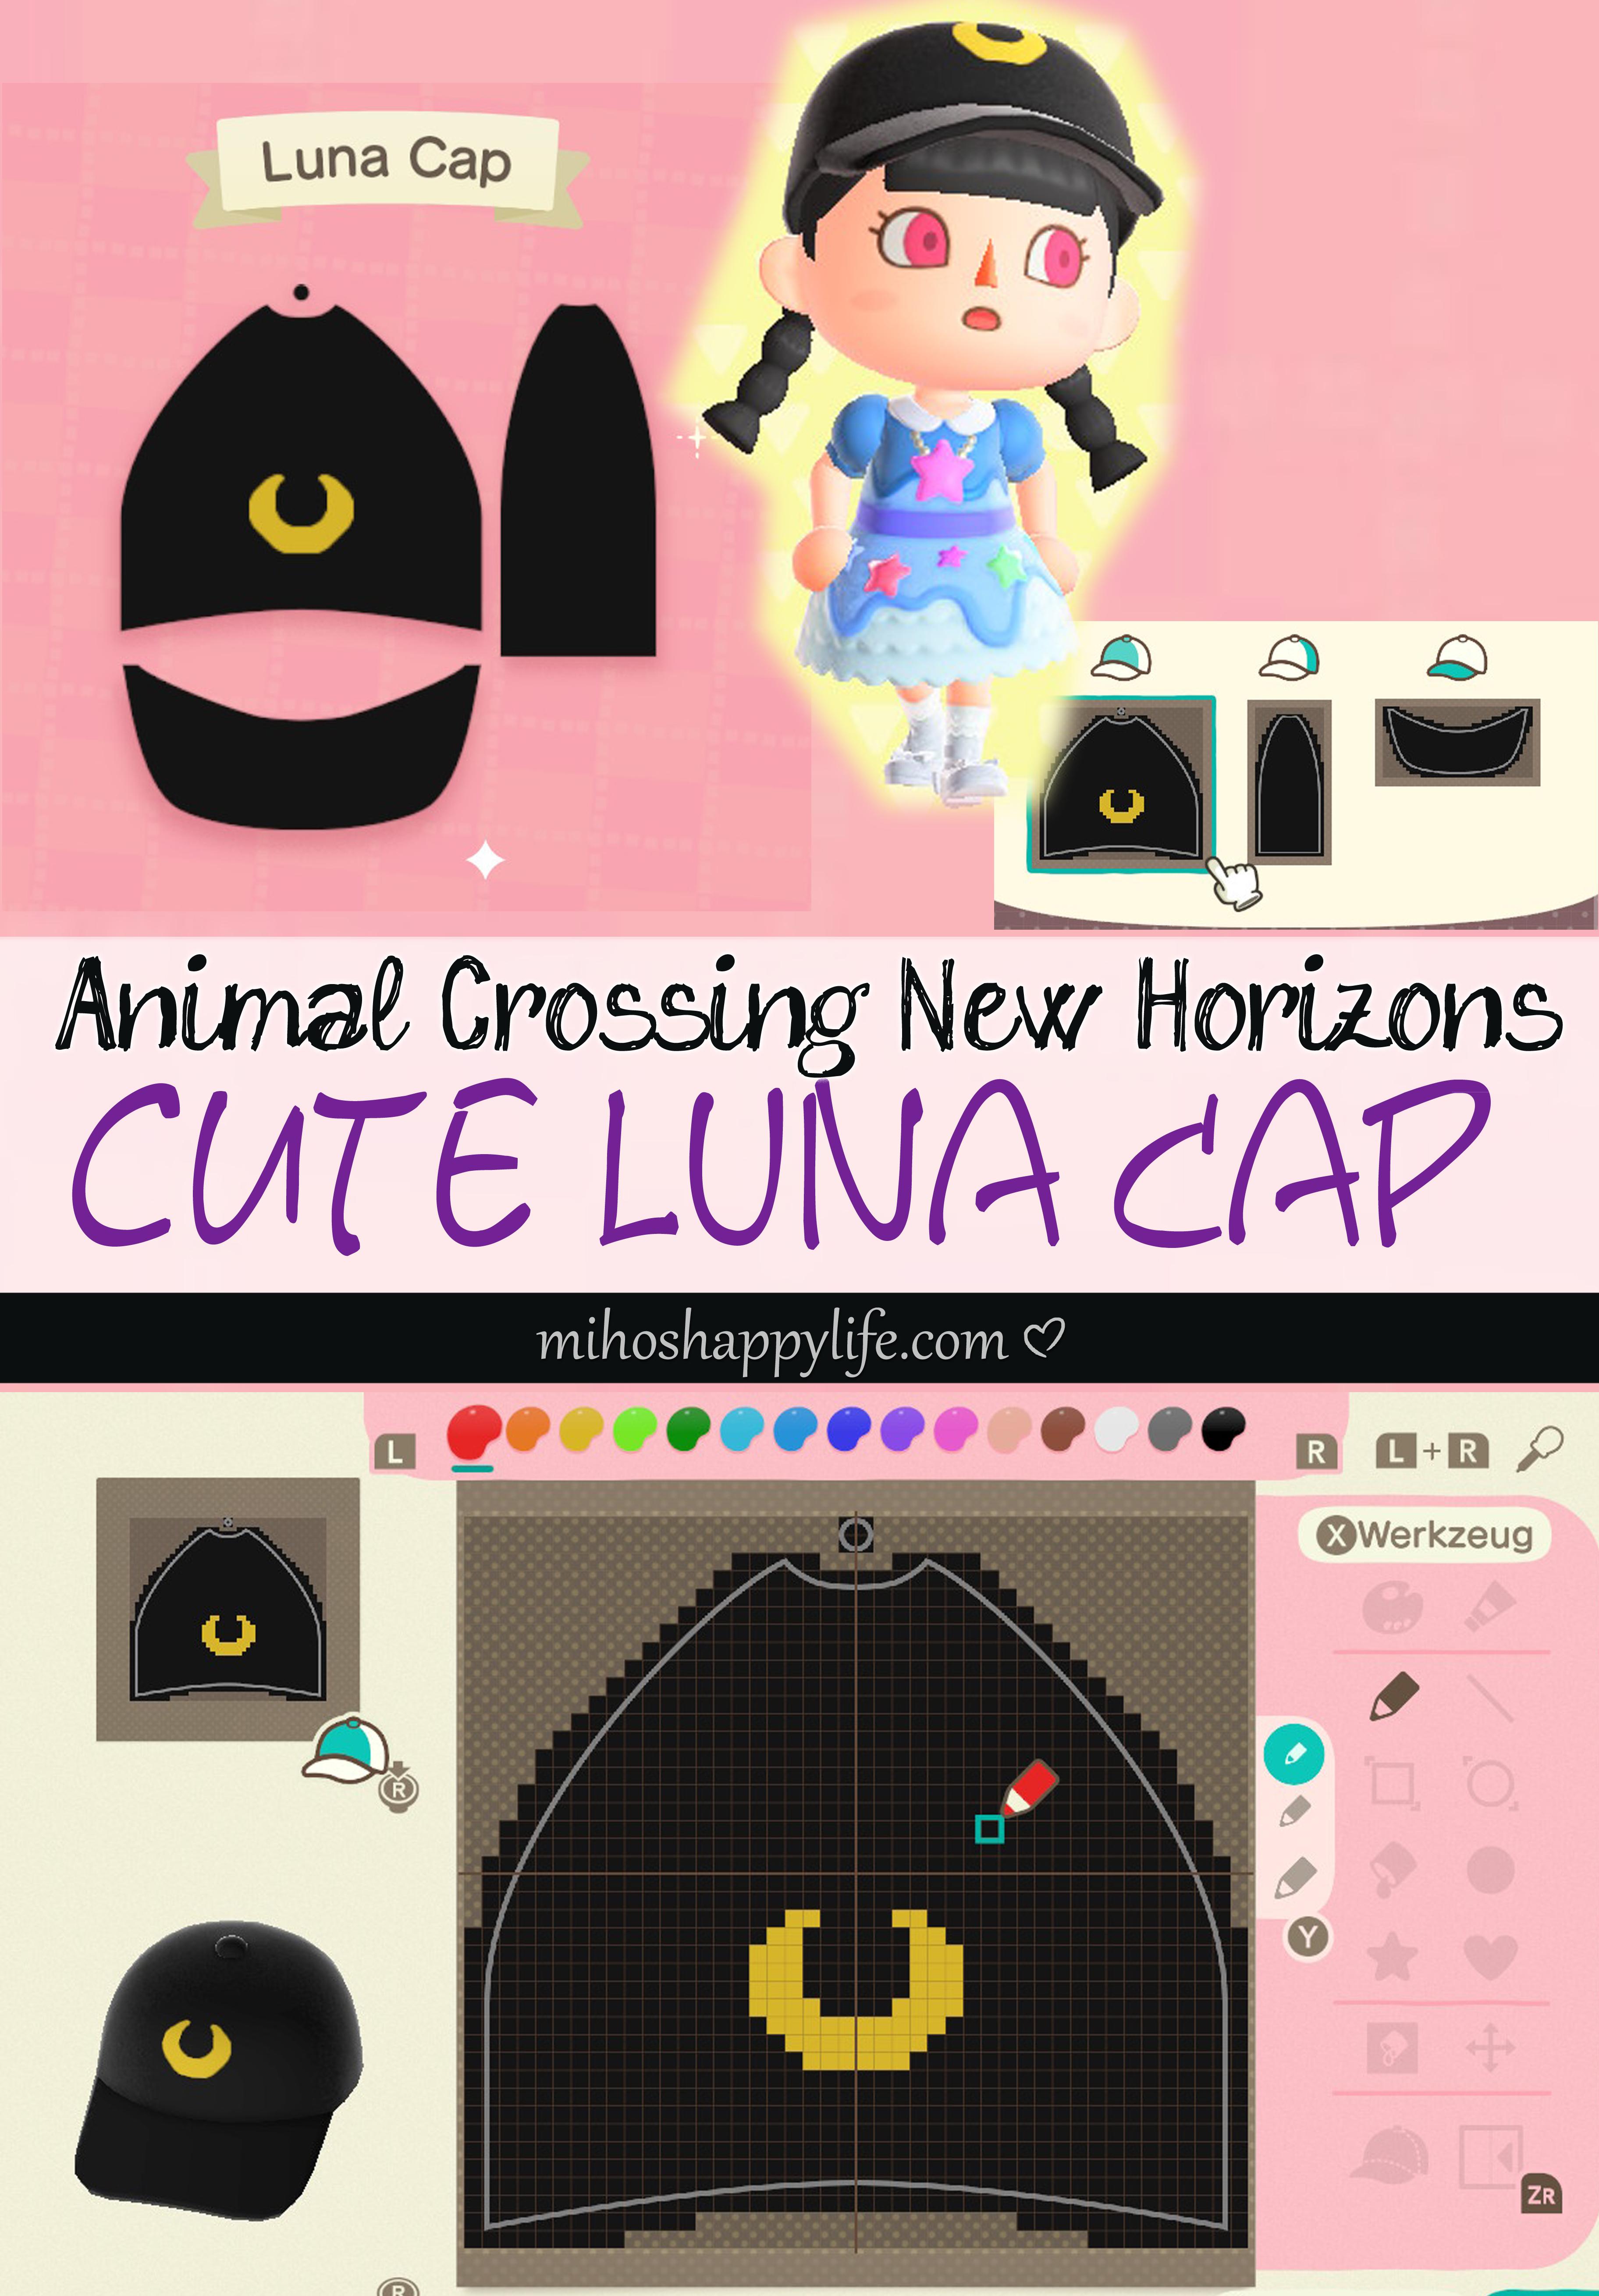 mihoshappylife-animal-crossing-sailormoon-luna-cap